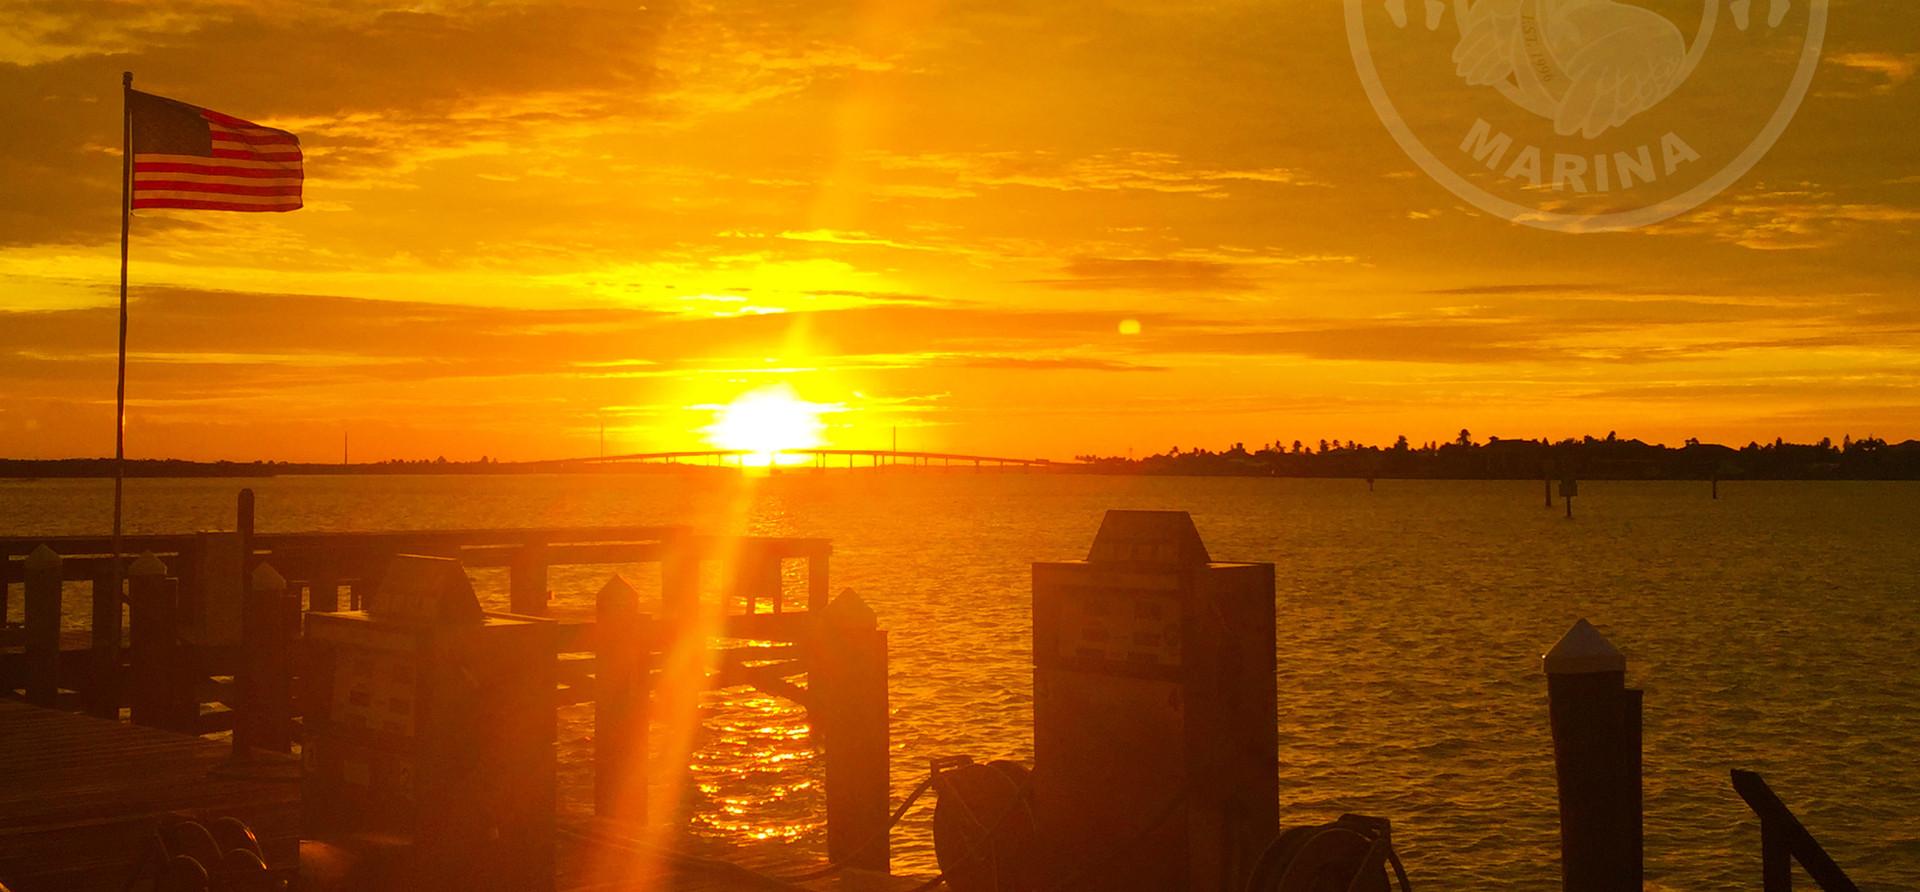 Sunsetting over Marco Bridge - Taken from Pelican Pier